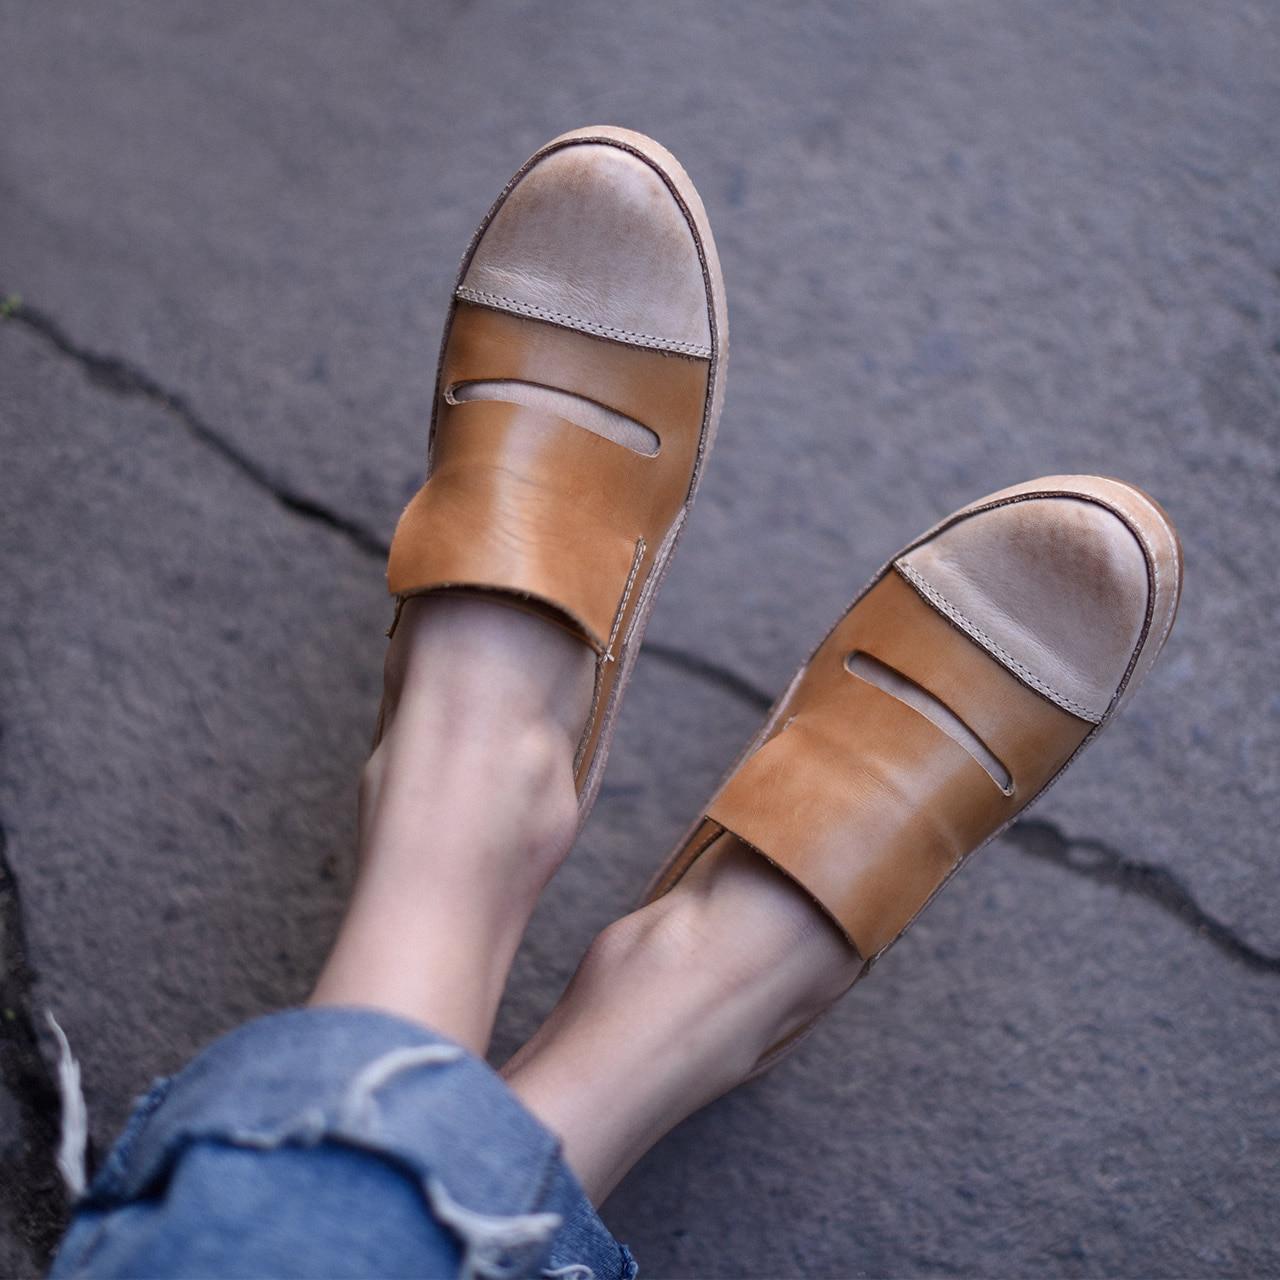 Chaussures De Creux Main Mocassins La Femme Lady Artmu Femmes En Mode Appartements Sapatos Femininos Casual À Oxford Cuir fpdIq